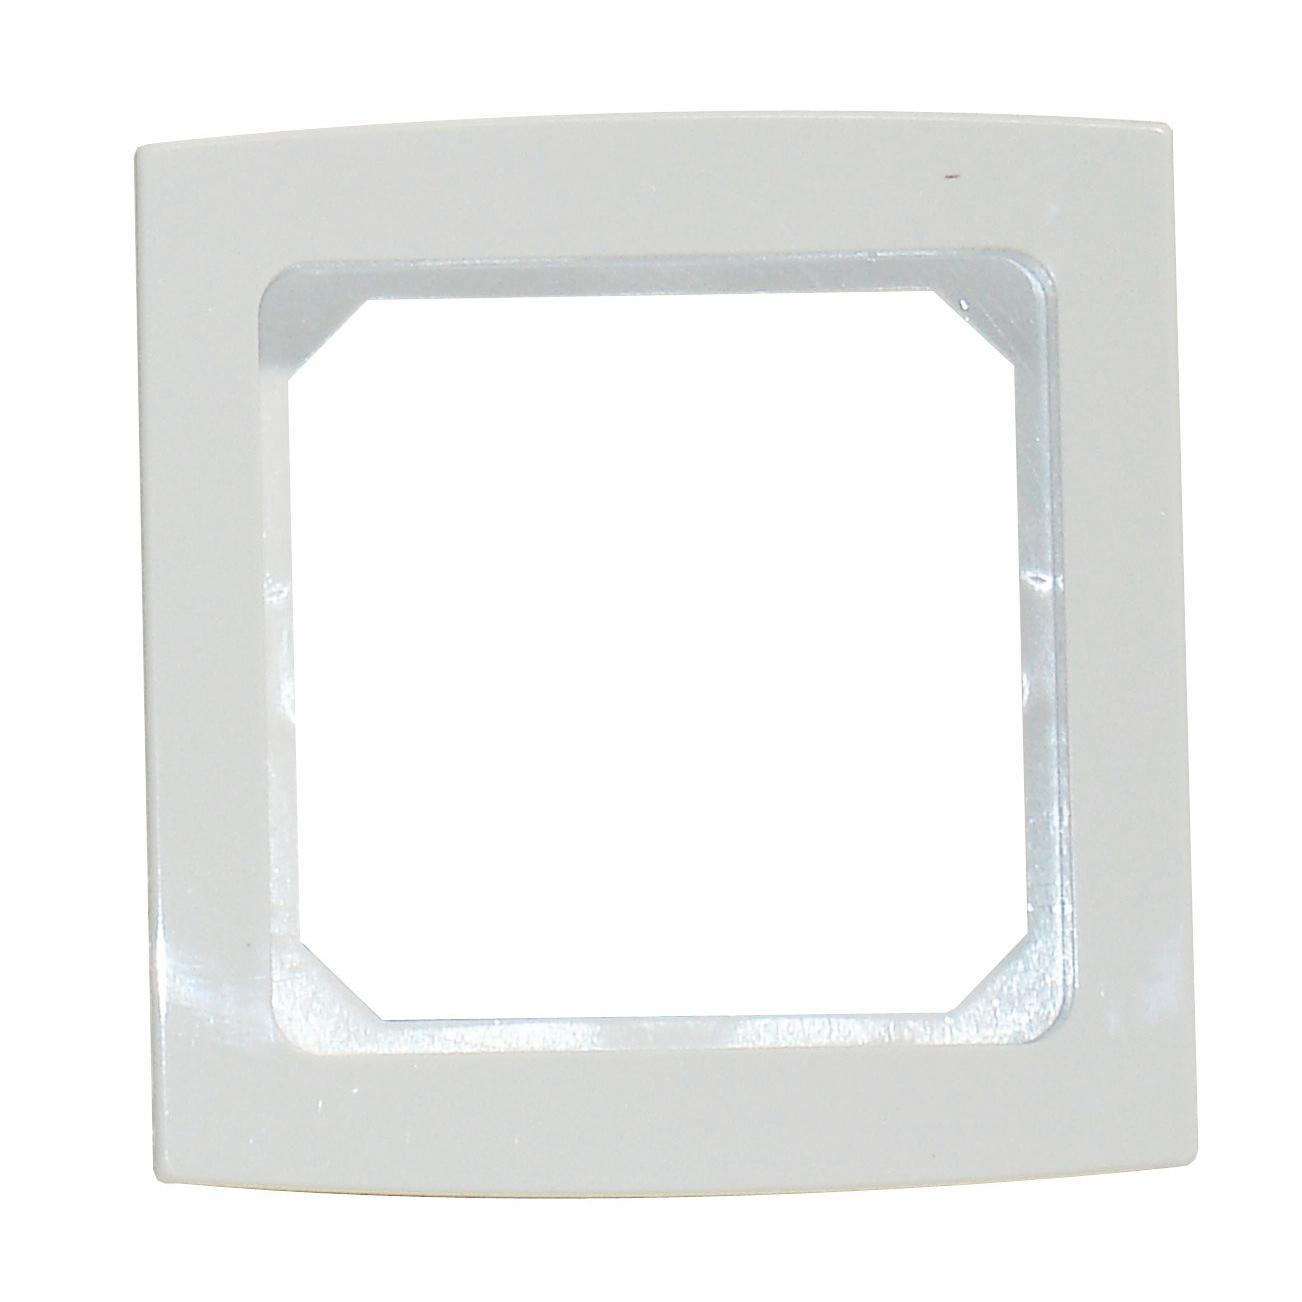 1 Stk Rahmen 1-fach, perlweiß Riva EL204120--